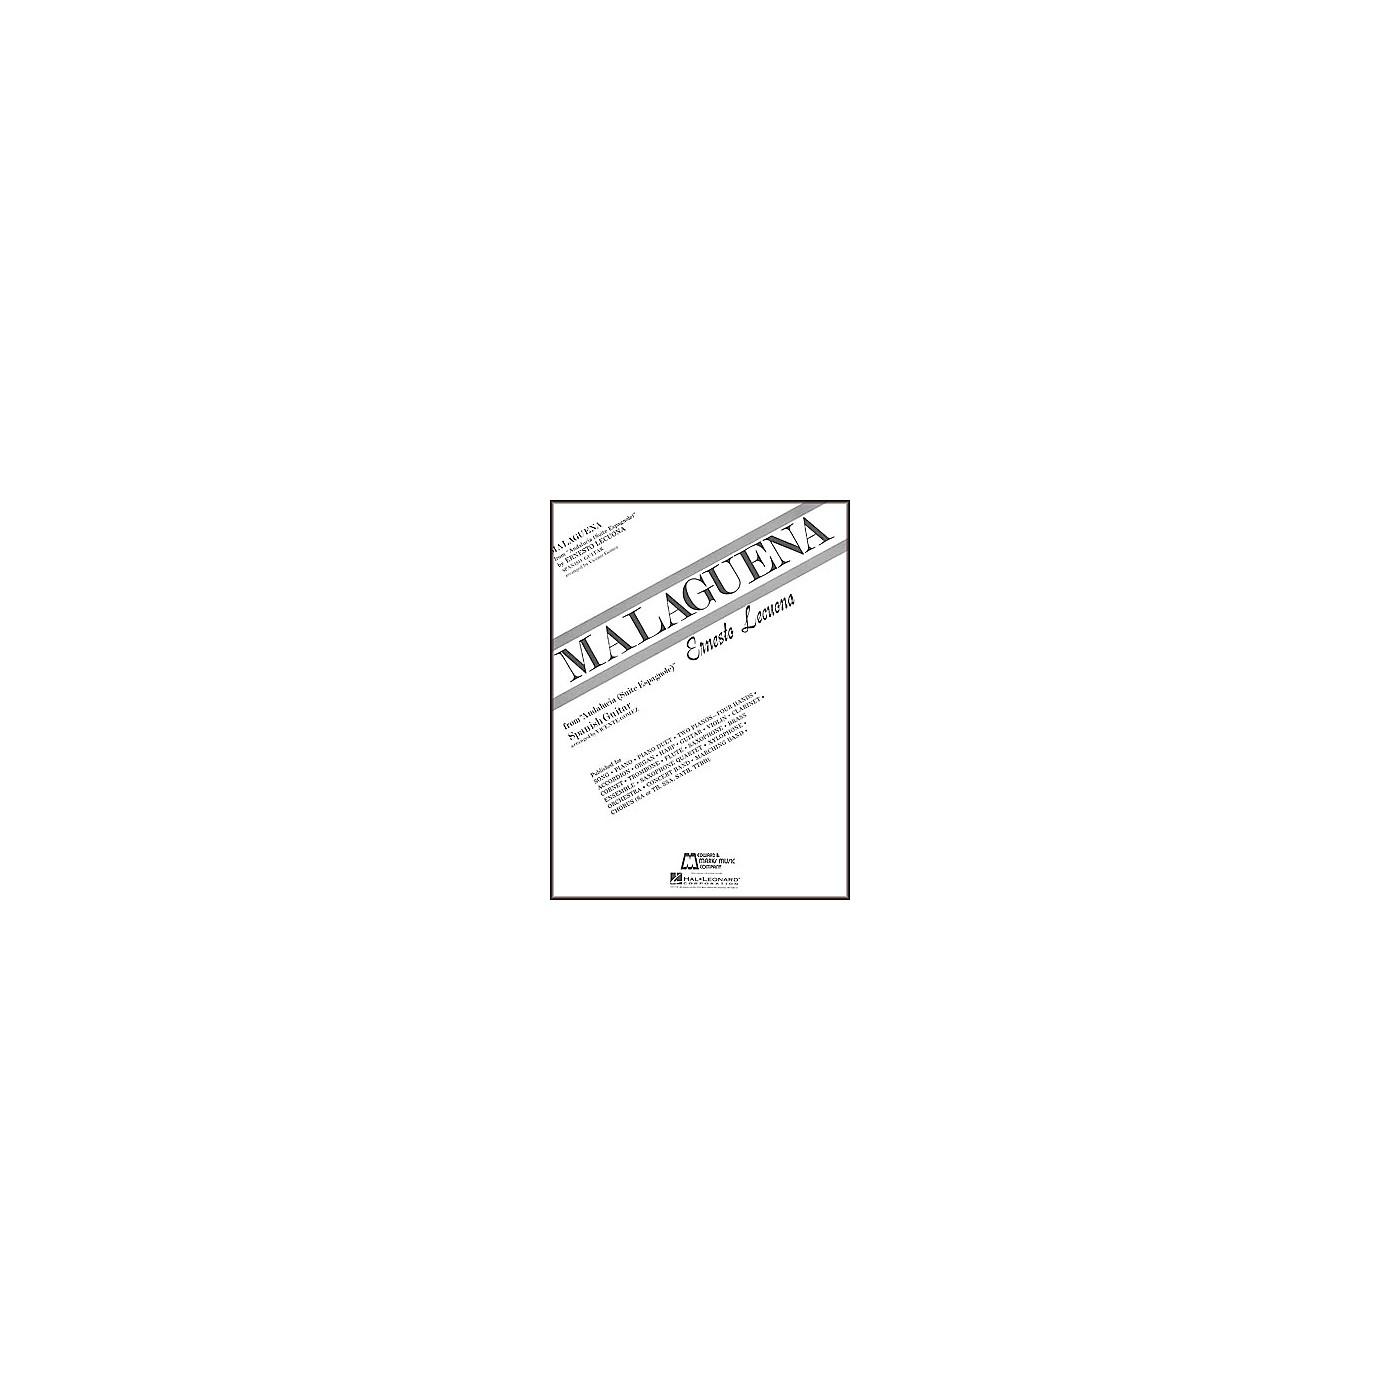 Edward B. Marks Music Company Lecuona: Malaguena Sheet Music For Classical Guitar Book thumbnail